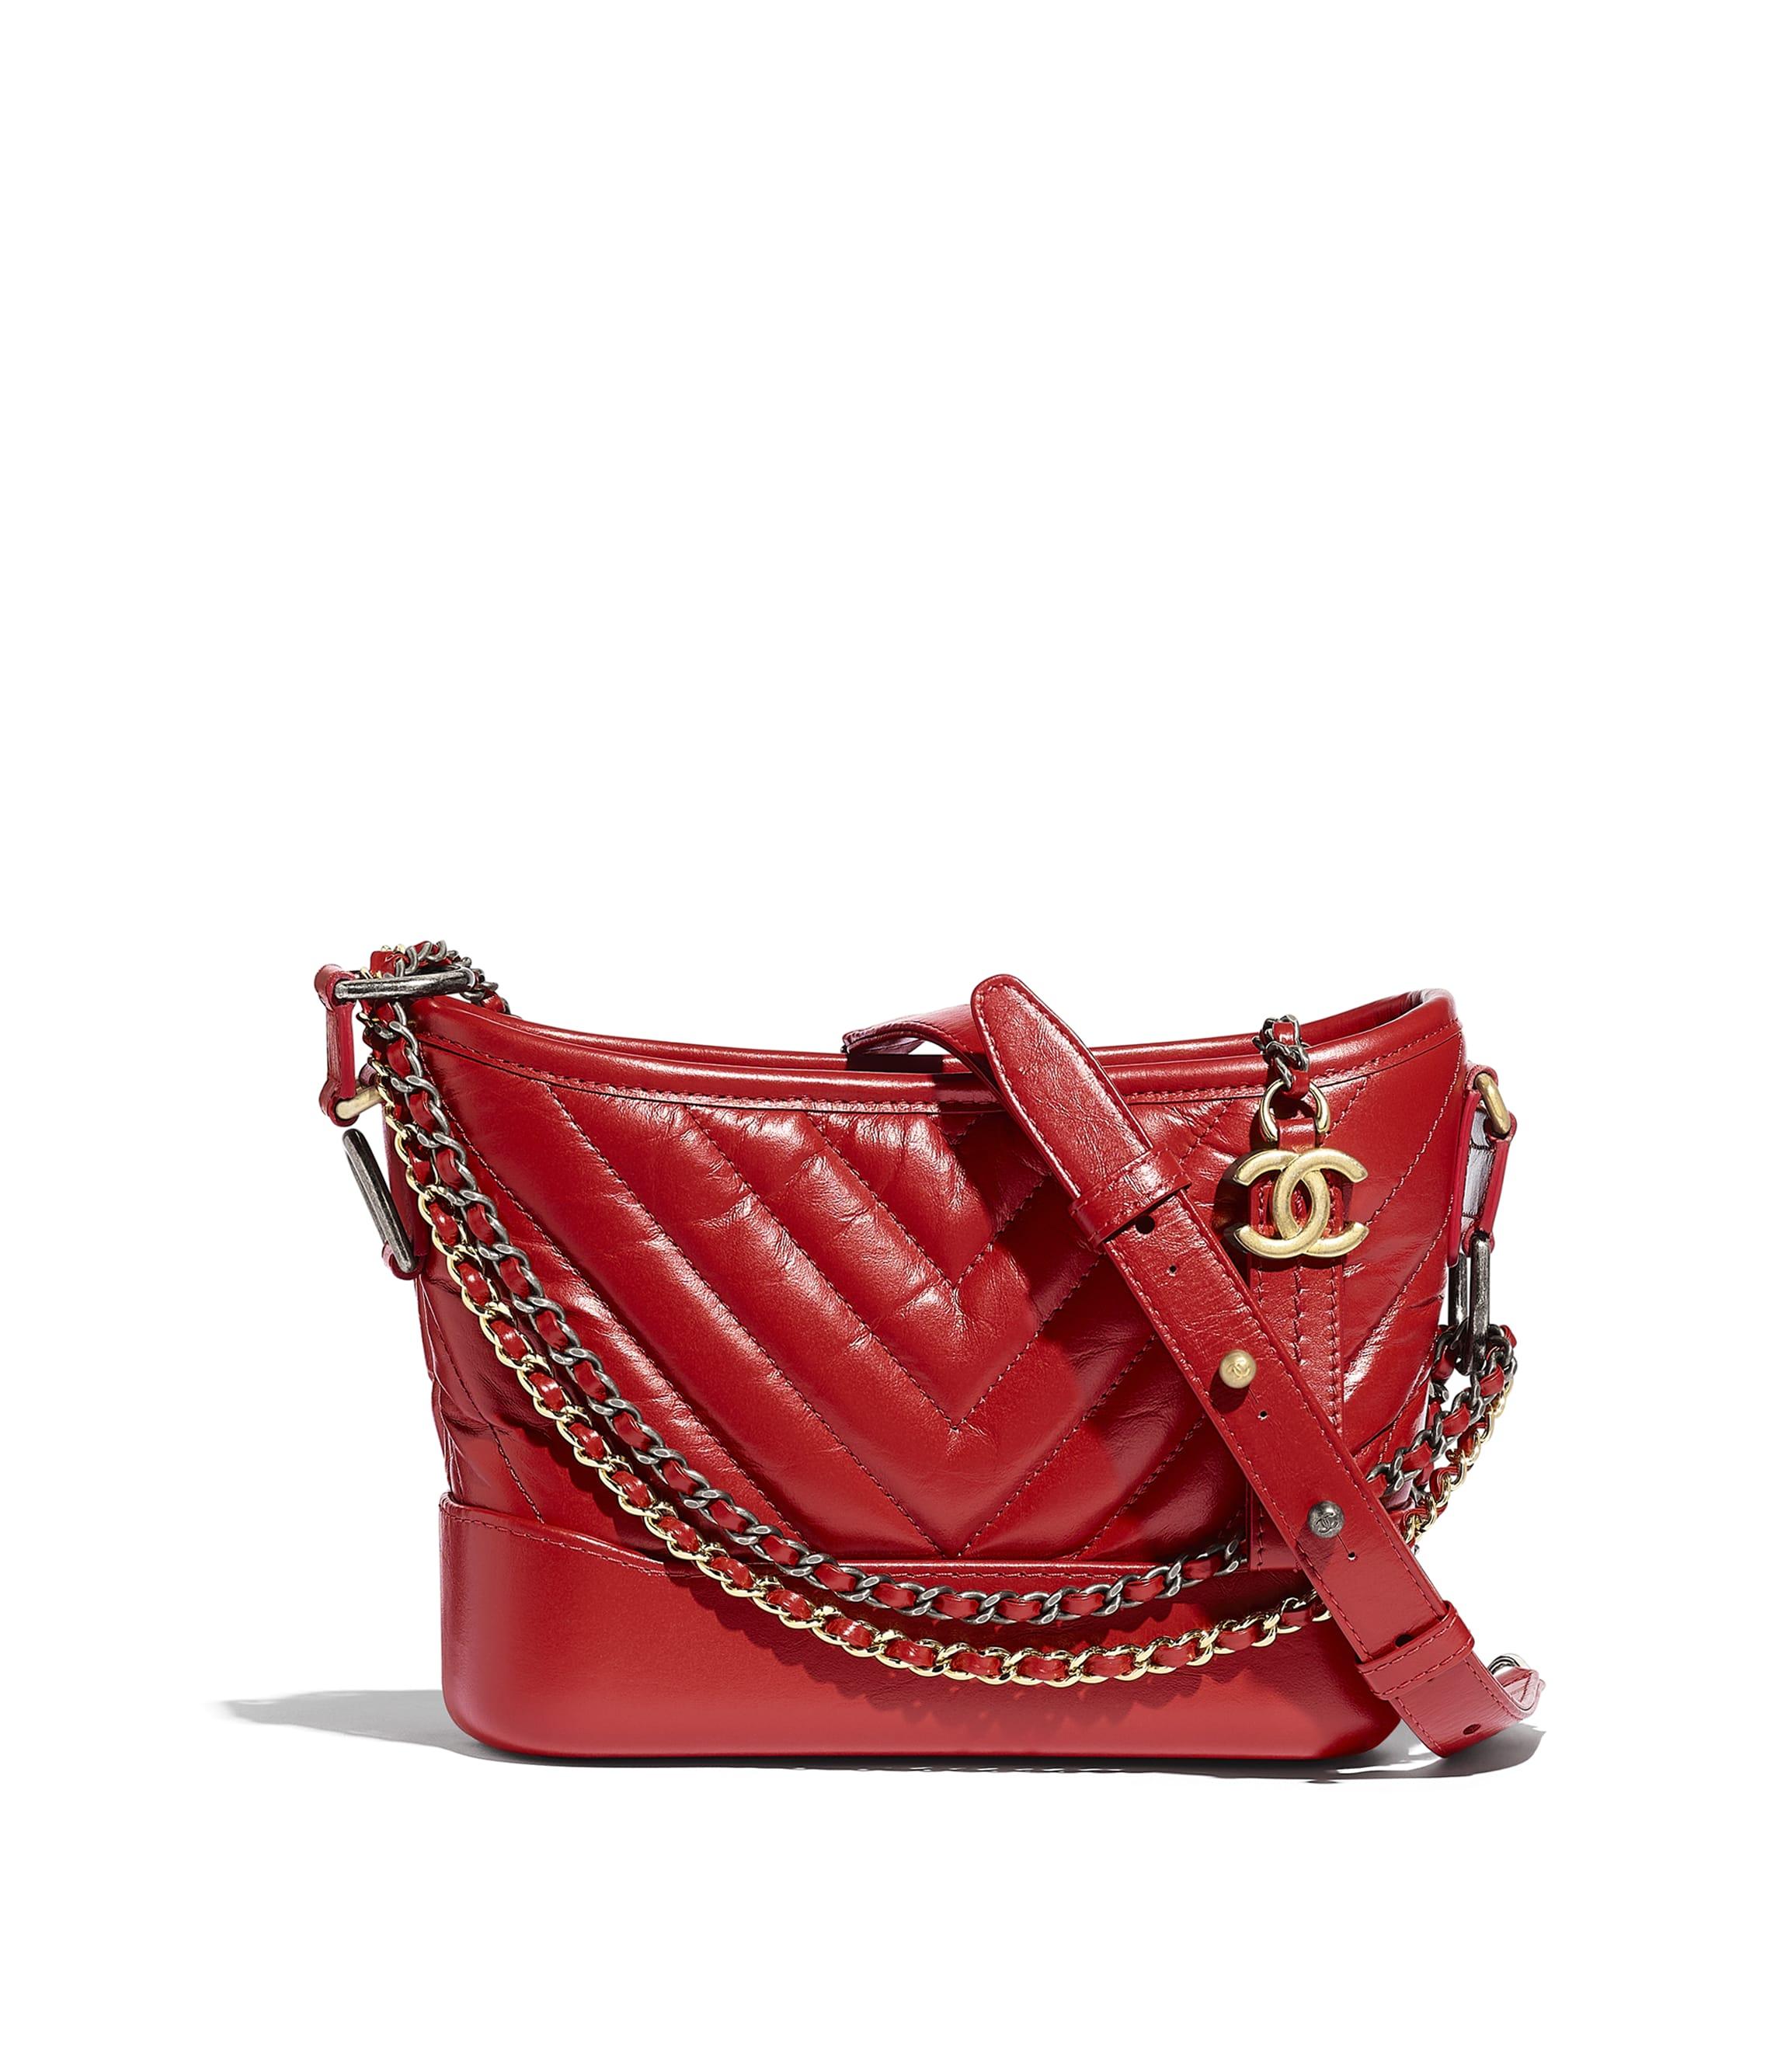 6b5b932ba126e7 CHANEL's GABRIELLE - Handbags - CHANEL